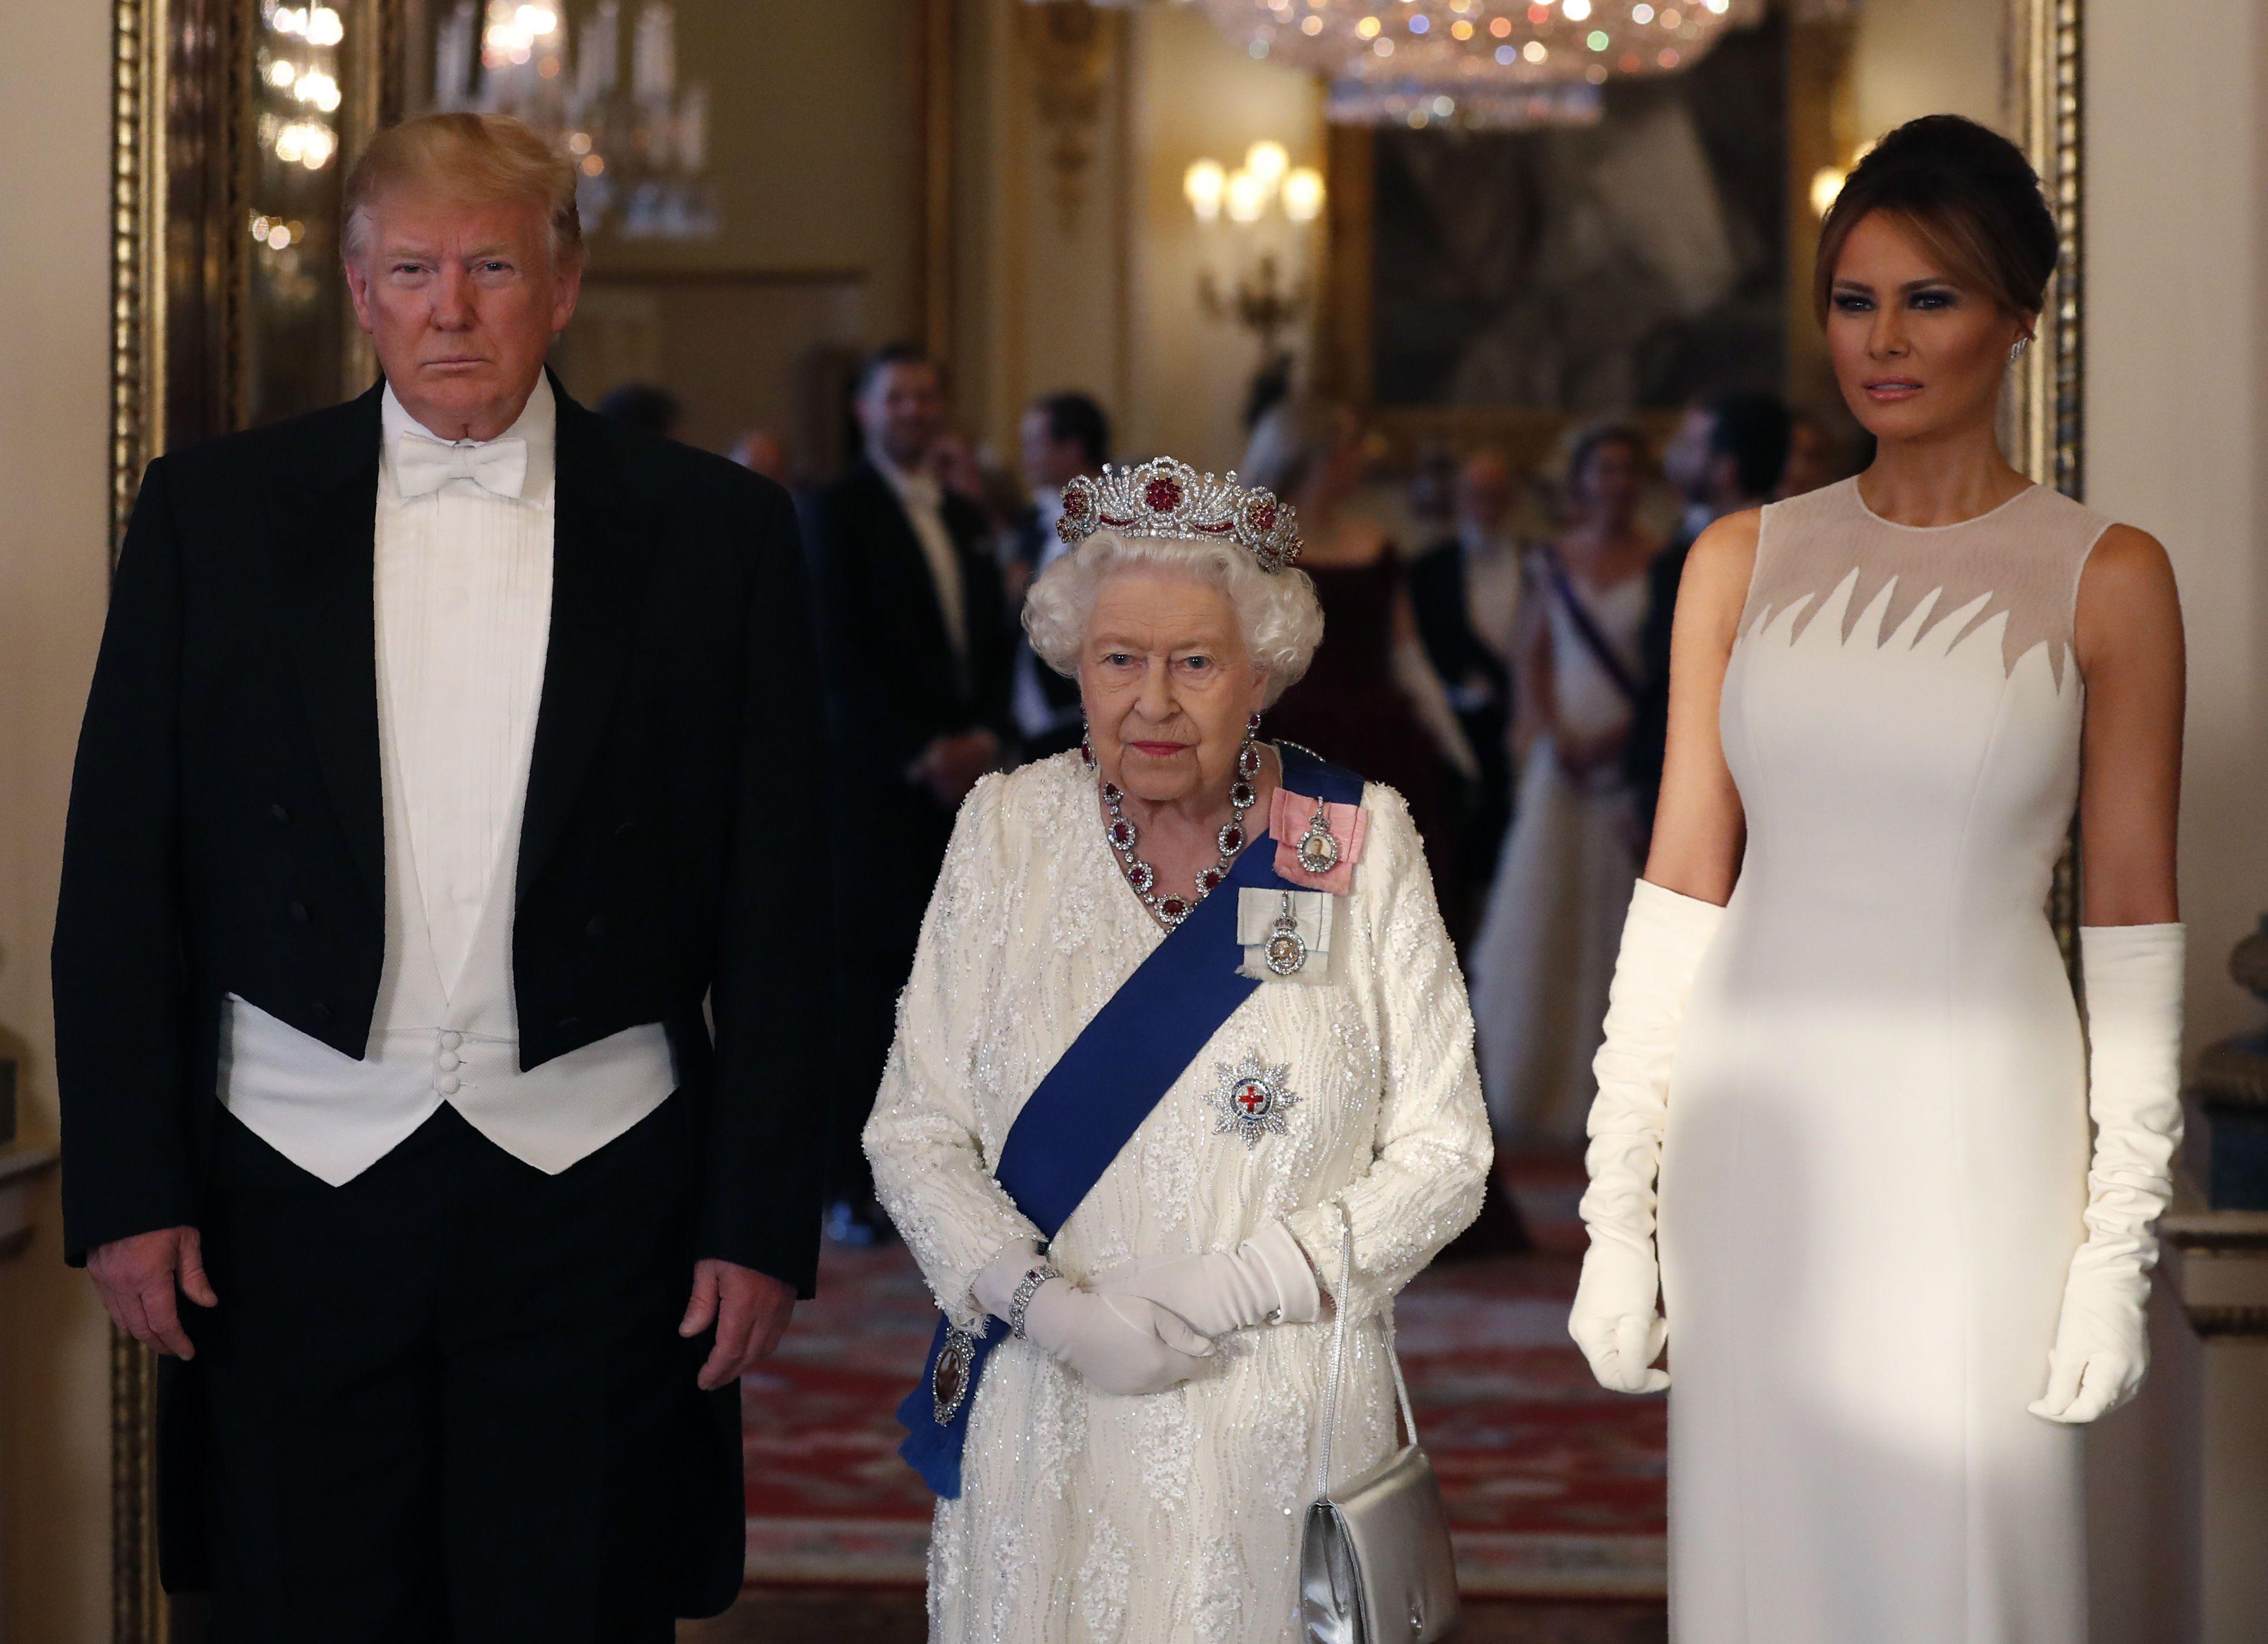 Кейт Міддлтон, королева, трамп_1